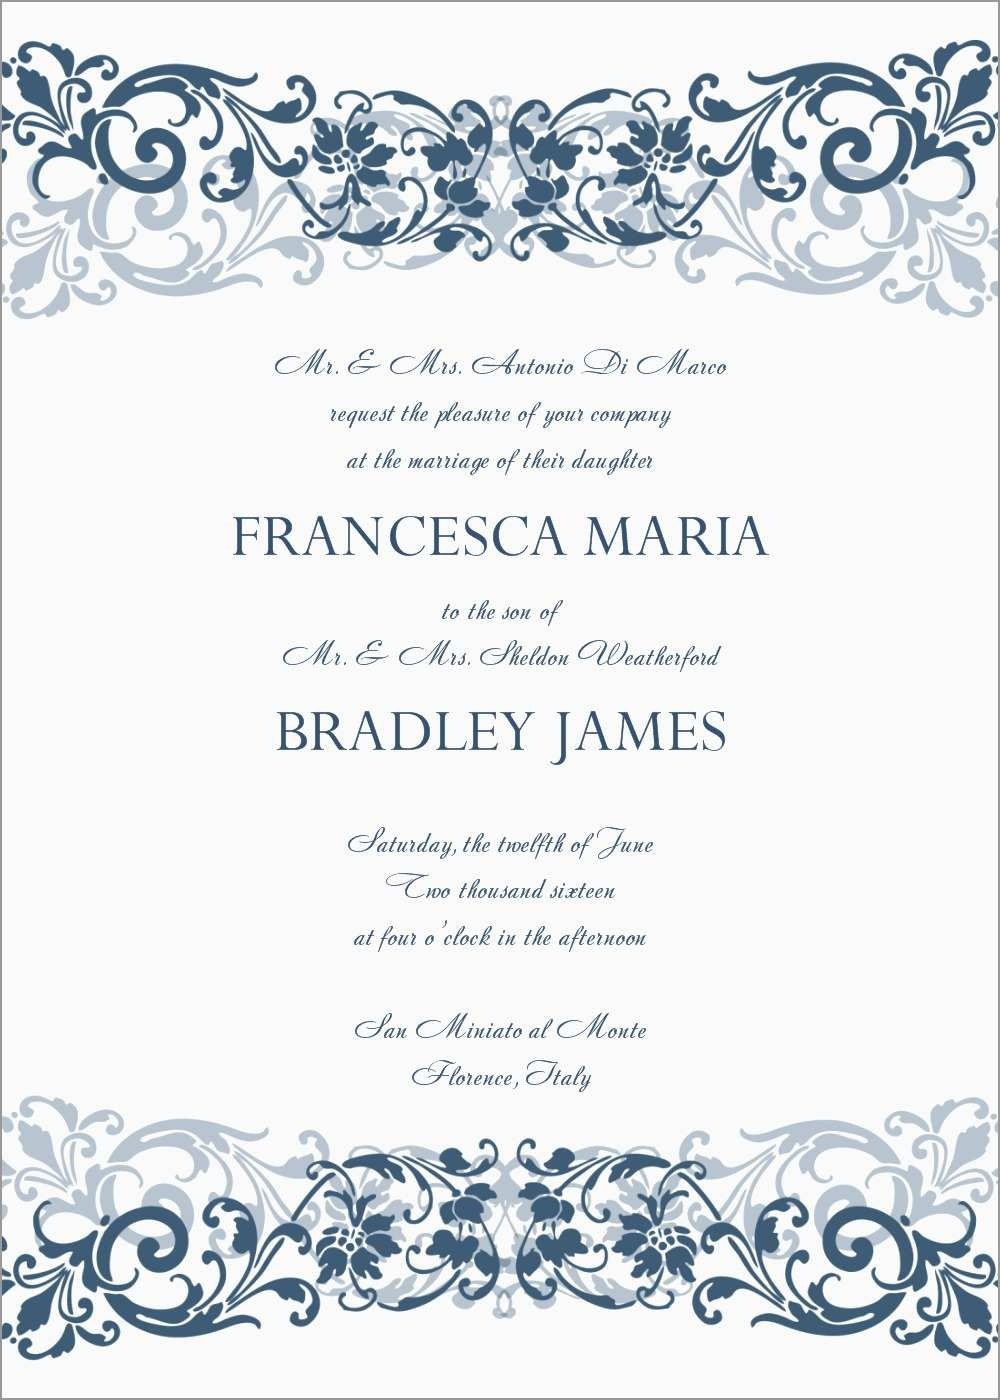 Free Printable Wedding Invitation Templates For Microsoft Word - Free Printable Wedding Invitation Templates For Microsoft Word